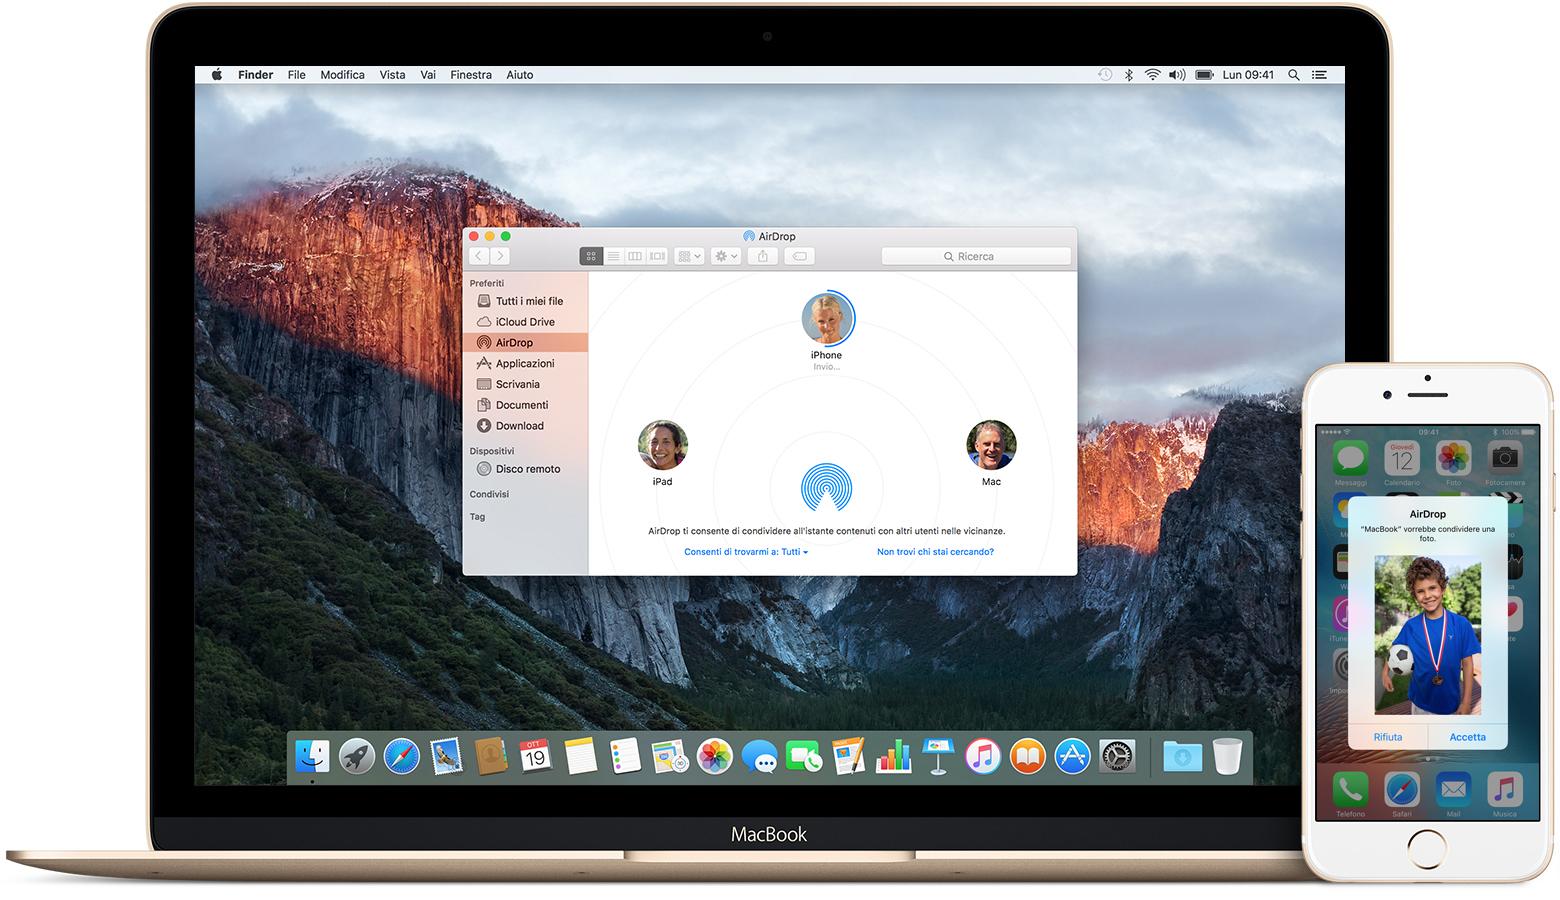 Trasferire foto da IPhone a Mac con AirDrop